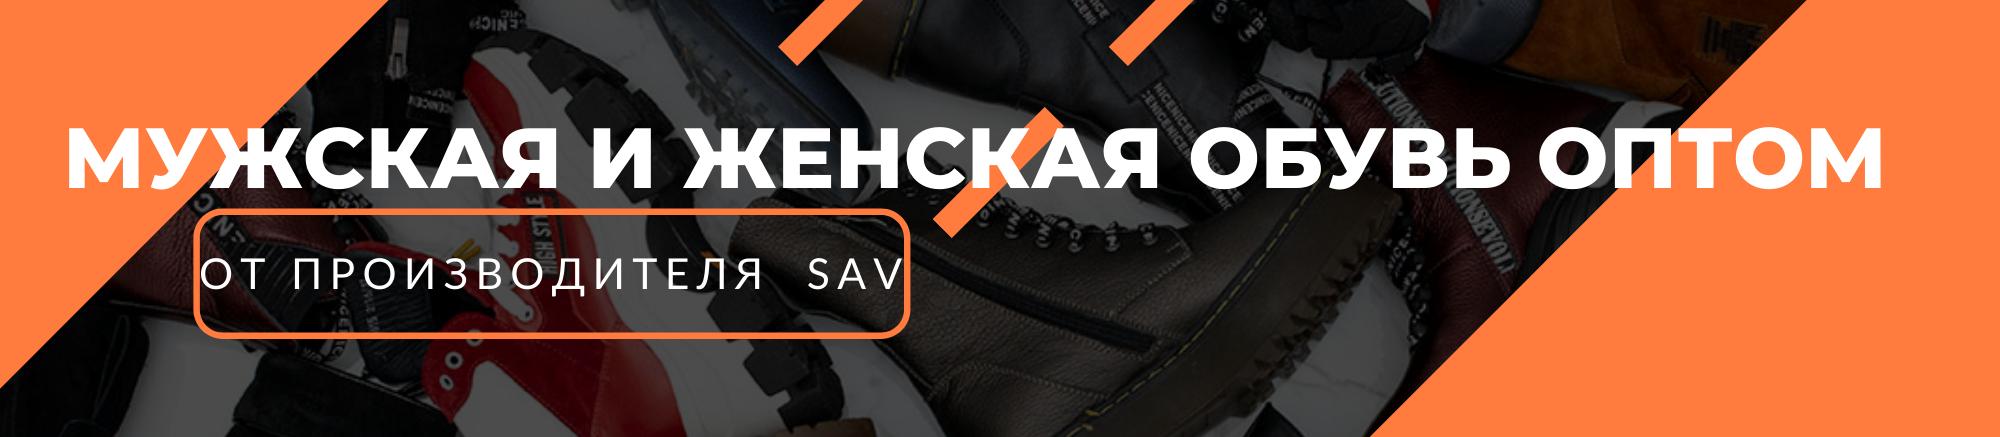 opt.sav.ua